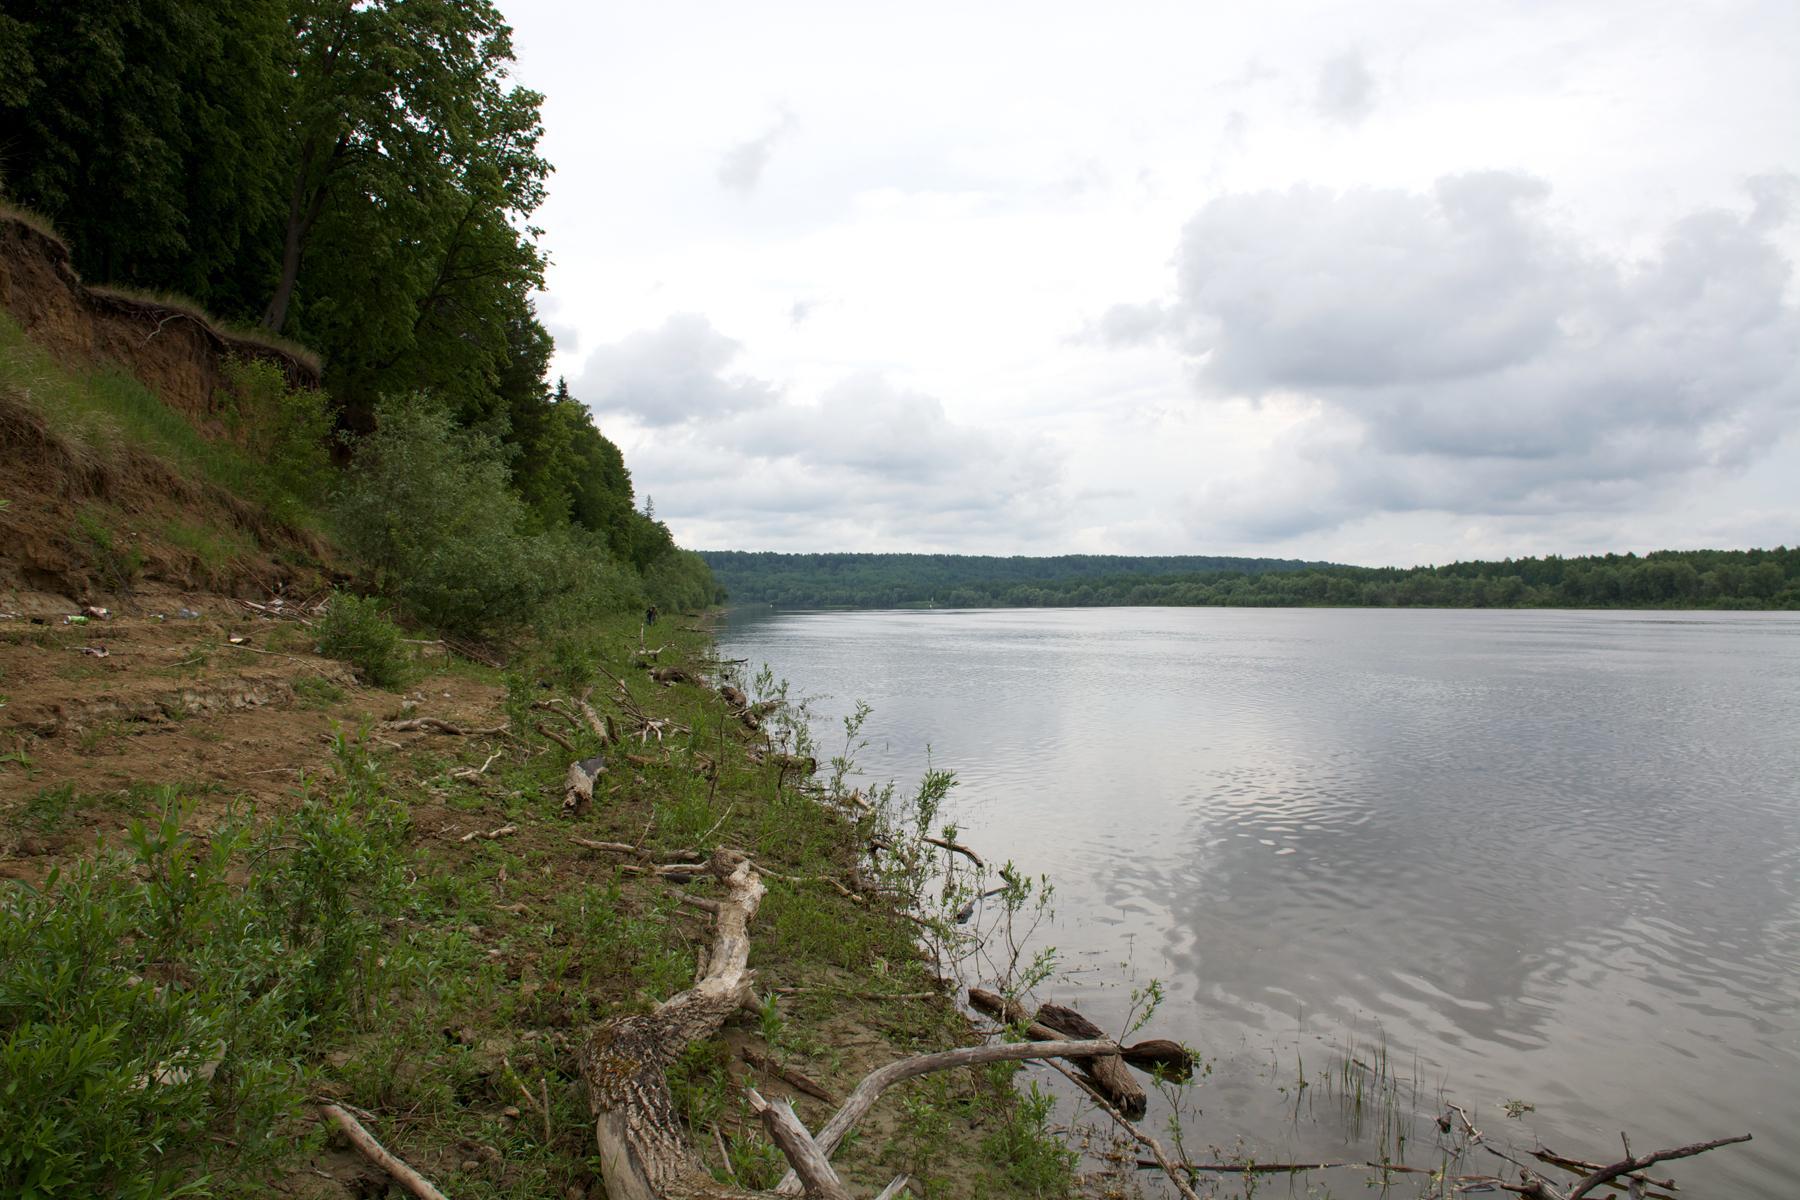 The irtysh river